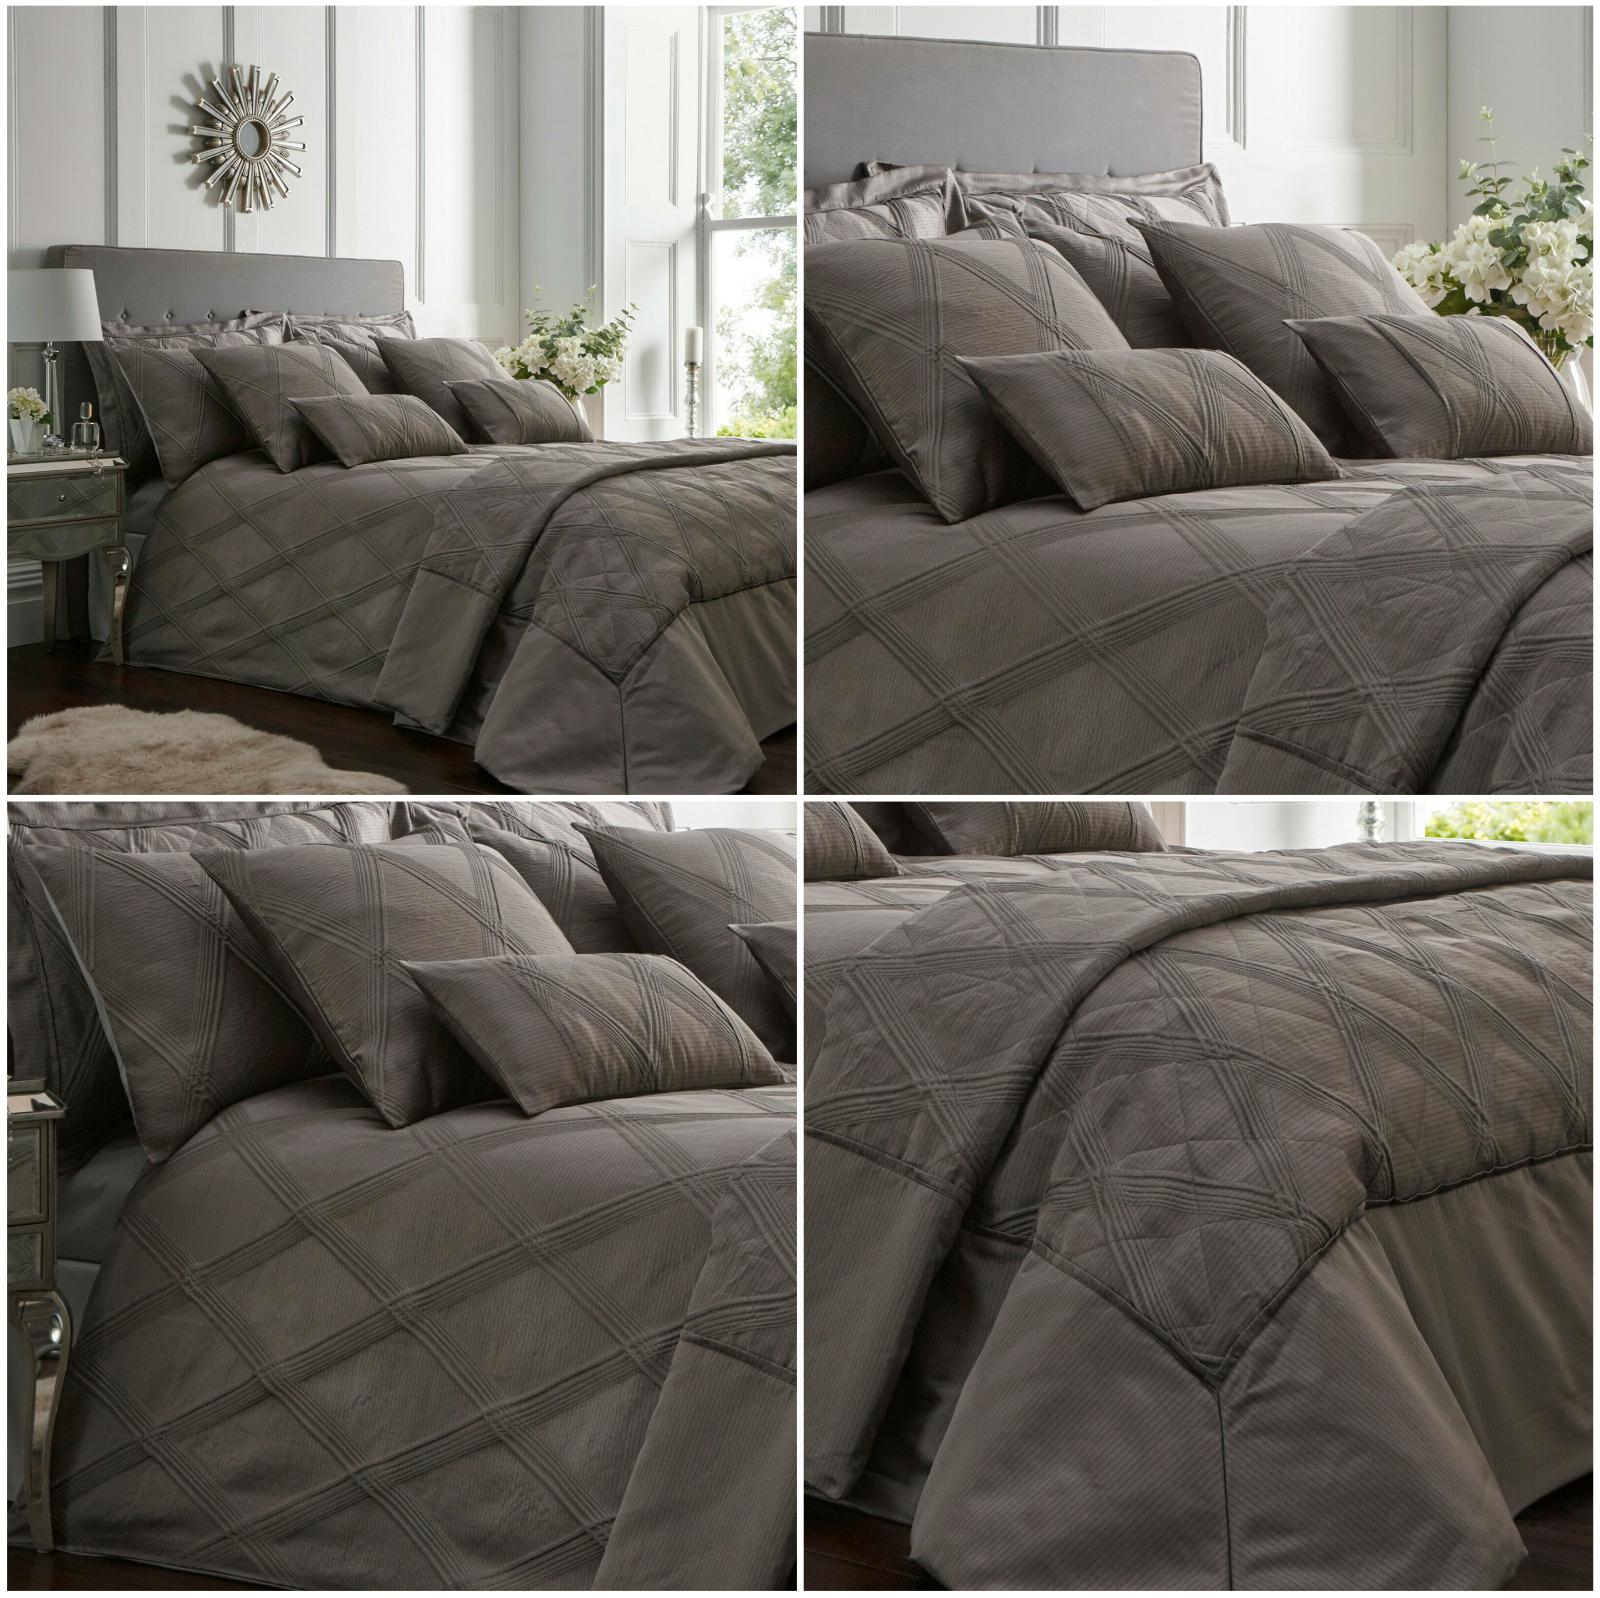 ORLANDO Modern Jacquard Duvet Cover Quilt Cover Set Bedding Range Charcoal